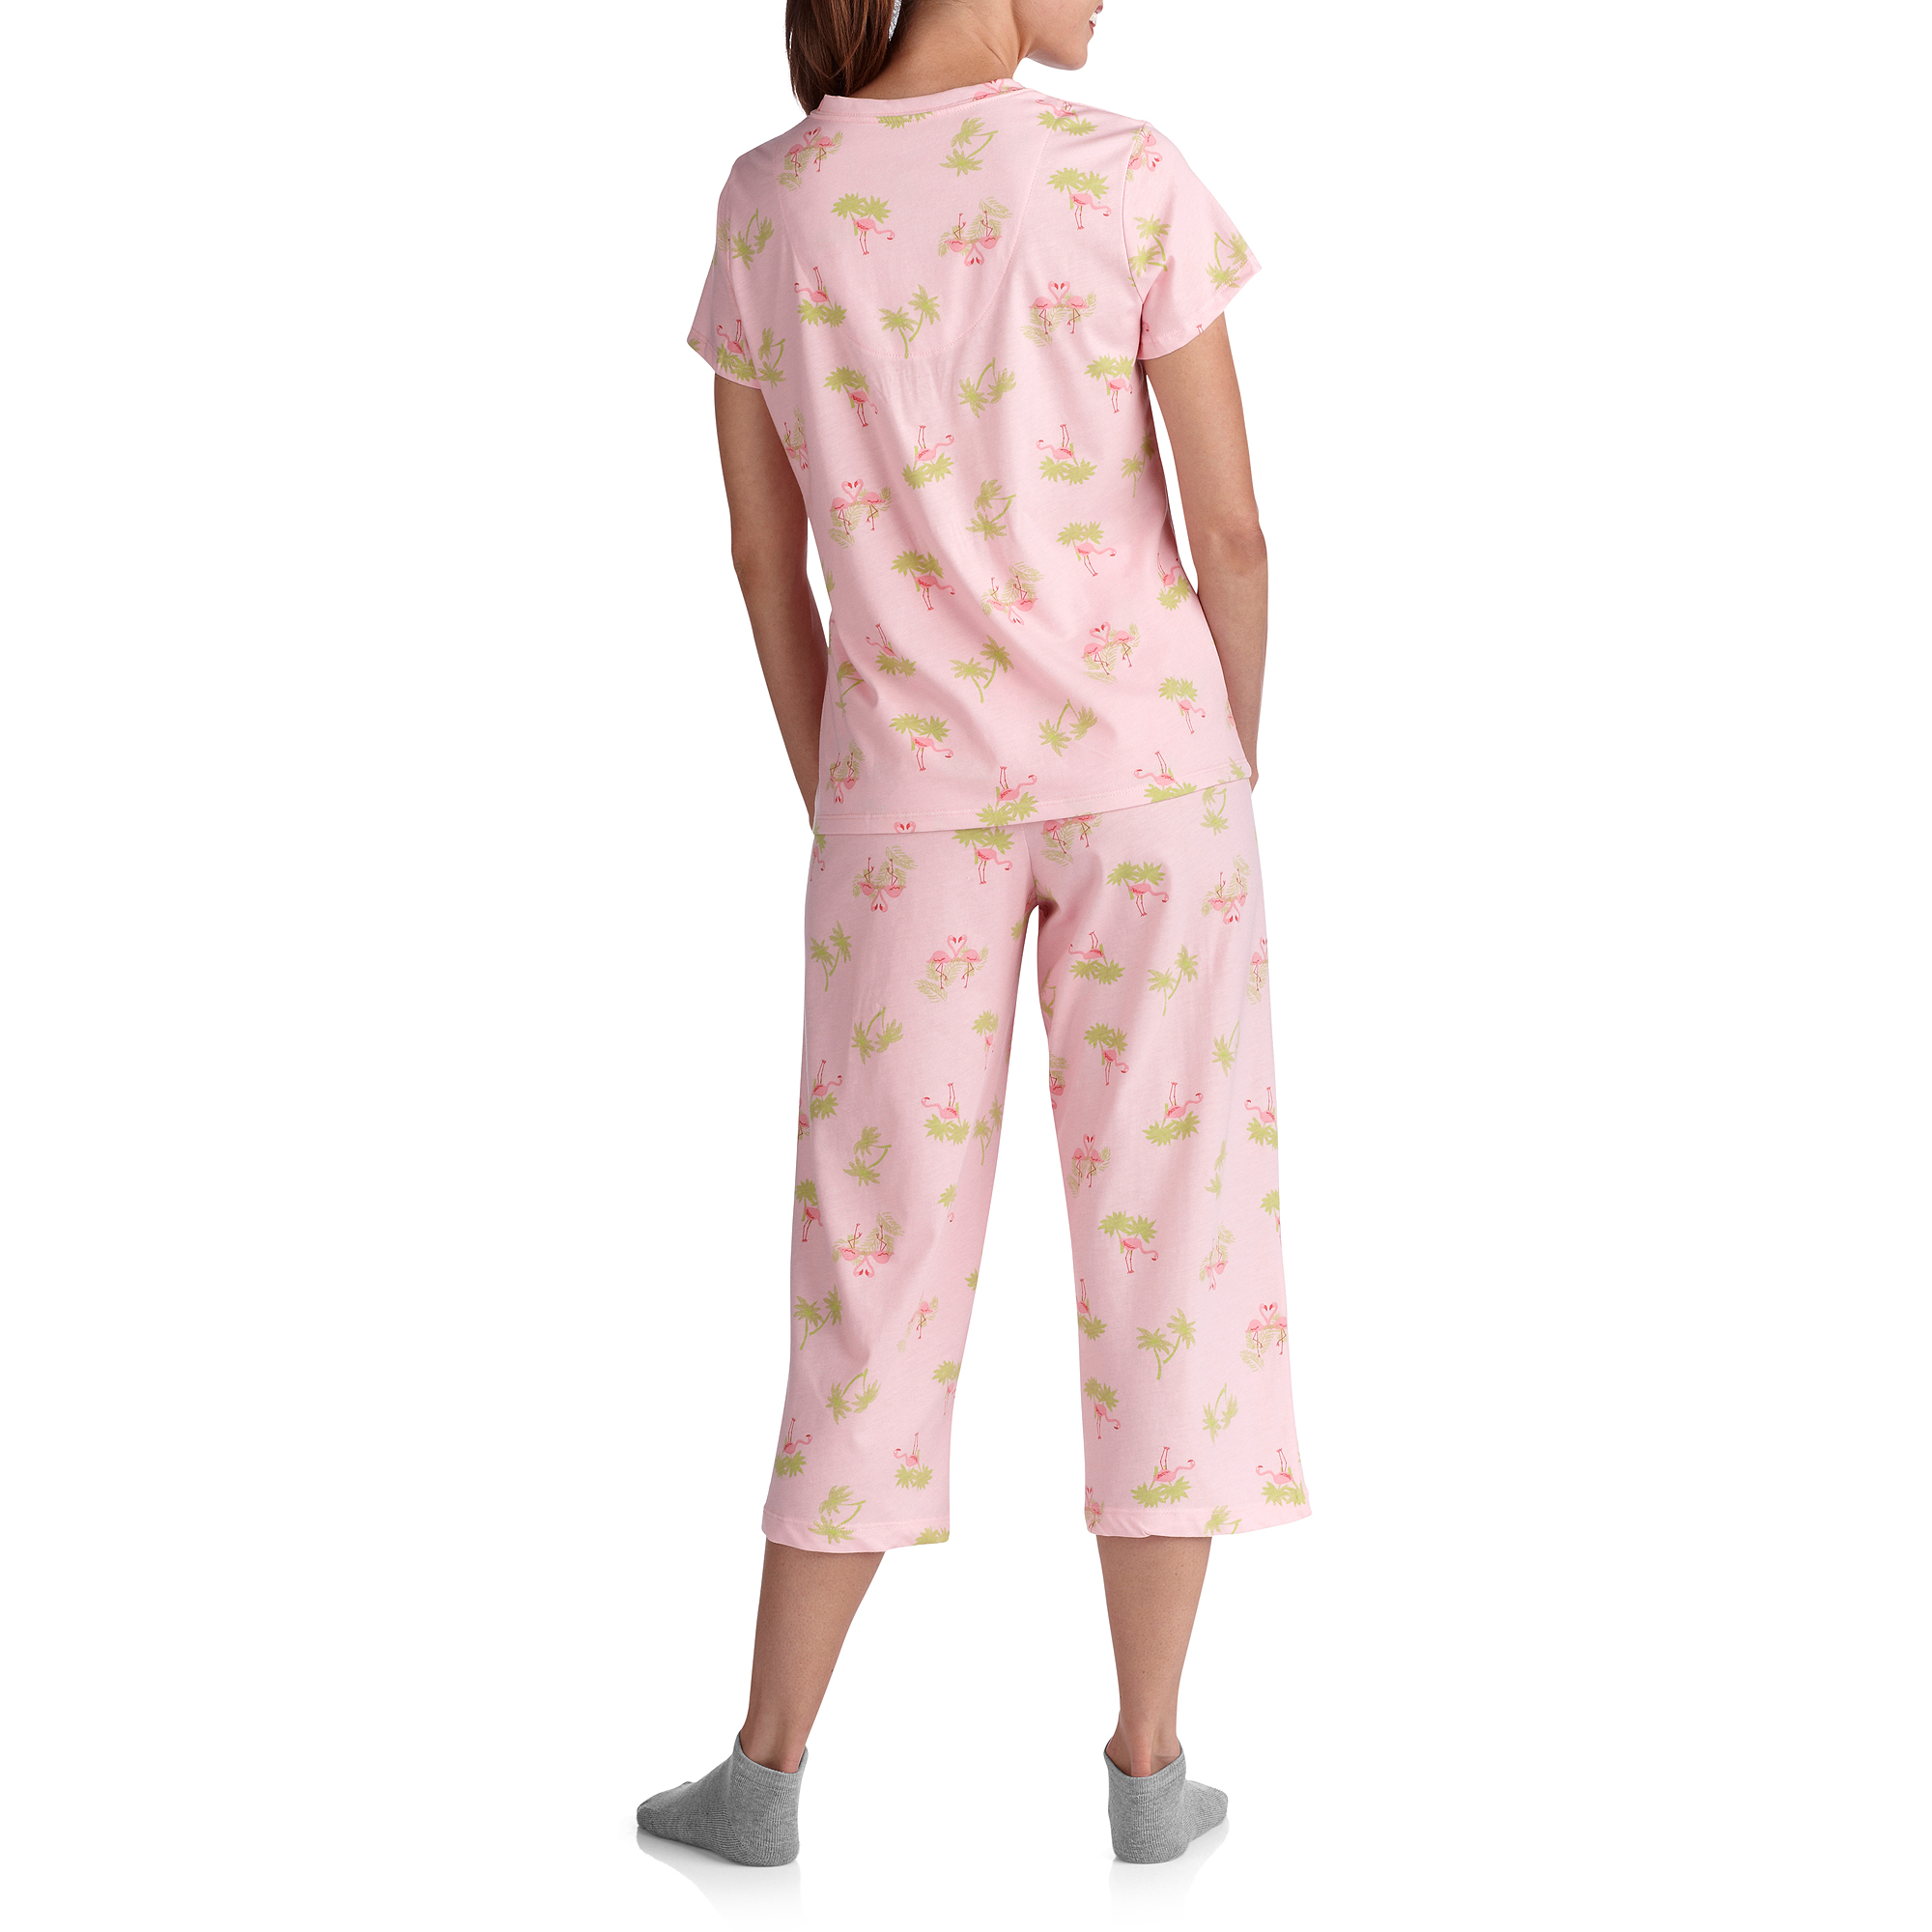 White Stag Women's V Neck Sleep Shirt and Pant PJ Set